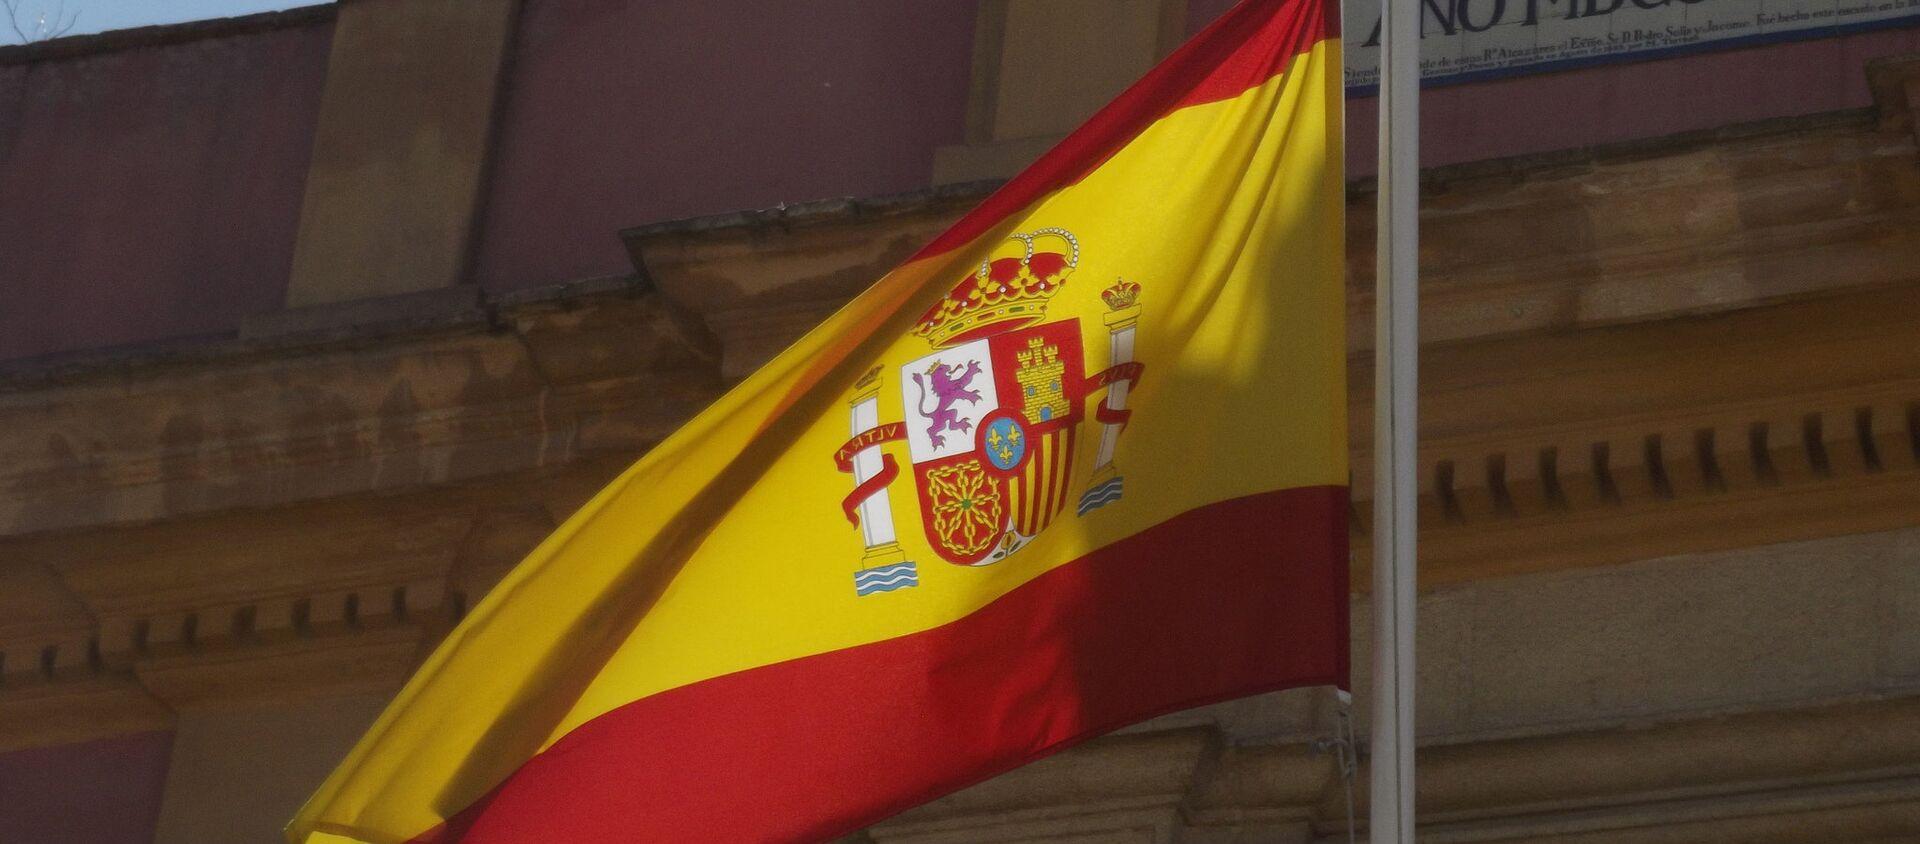 Flaga Hiszpanii - Sputnik Polska, 1920, 30.05.2021